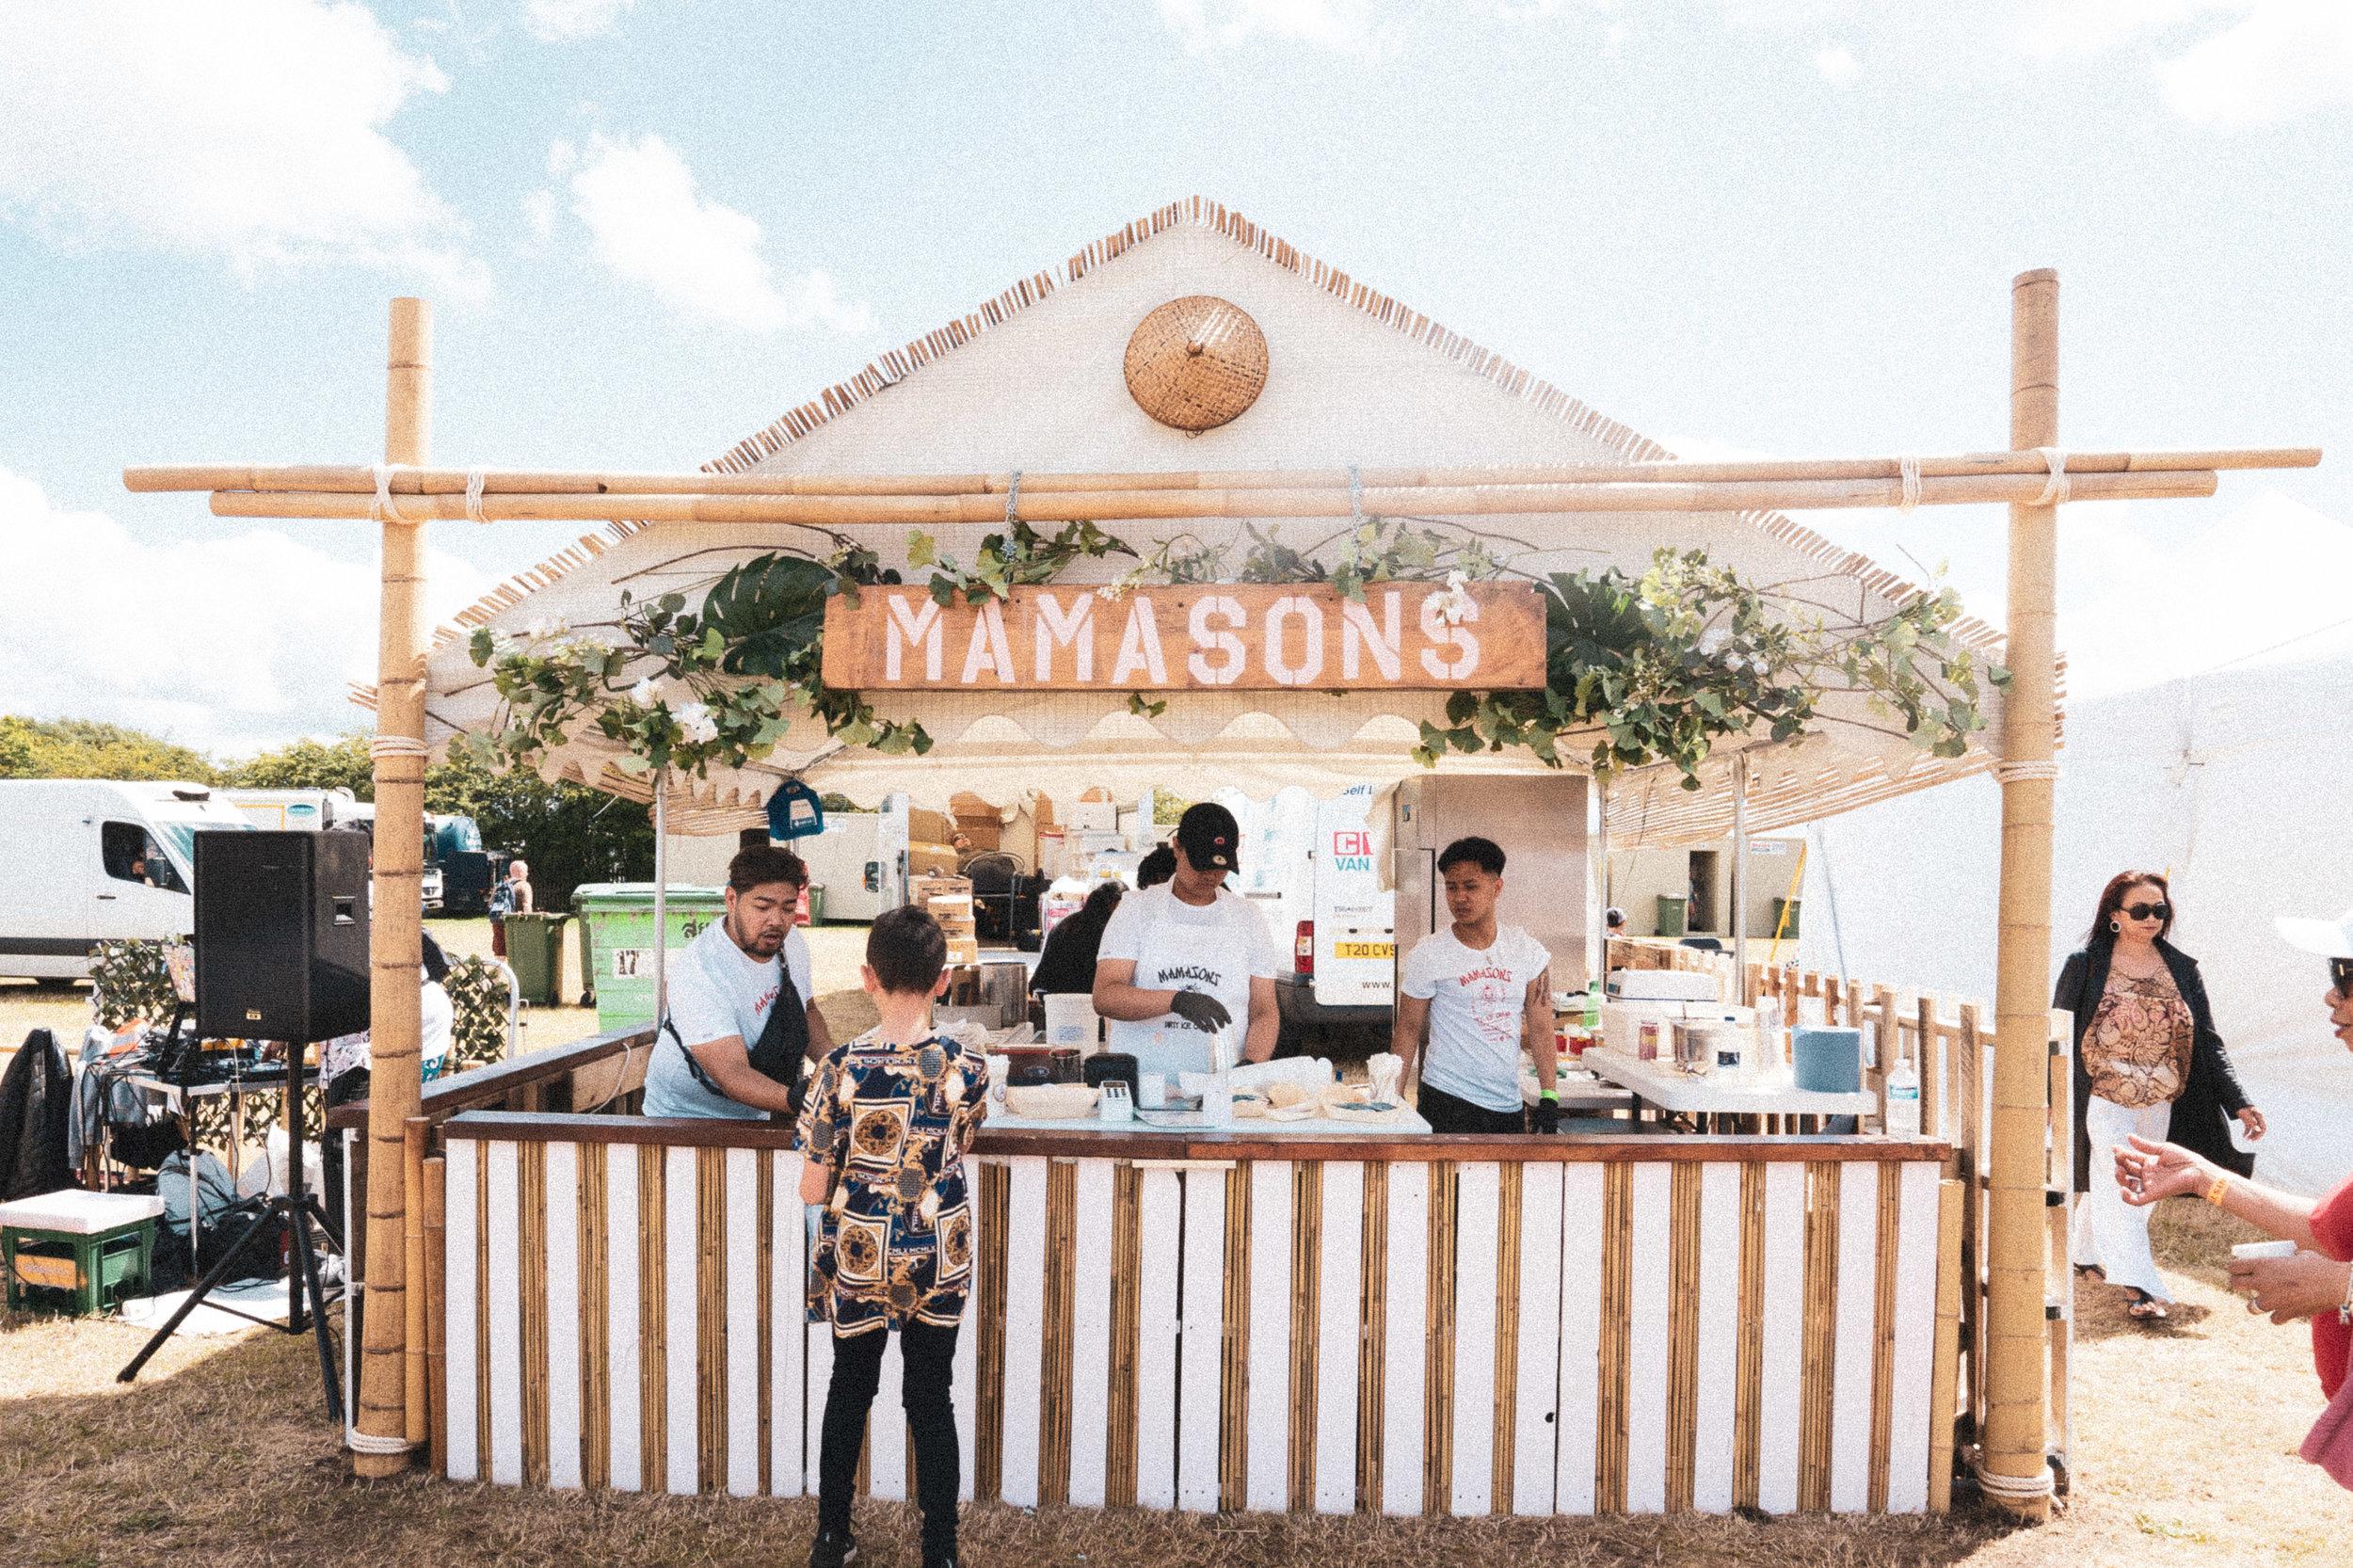 MAMASONS-LONDON-BARRIO-FIESTA-2019-22.jpg